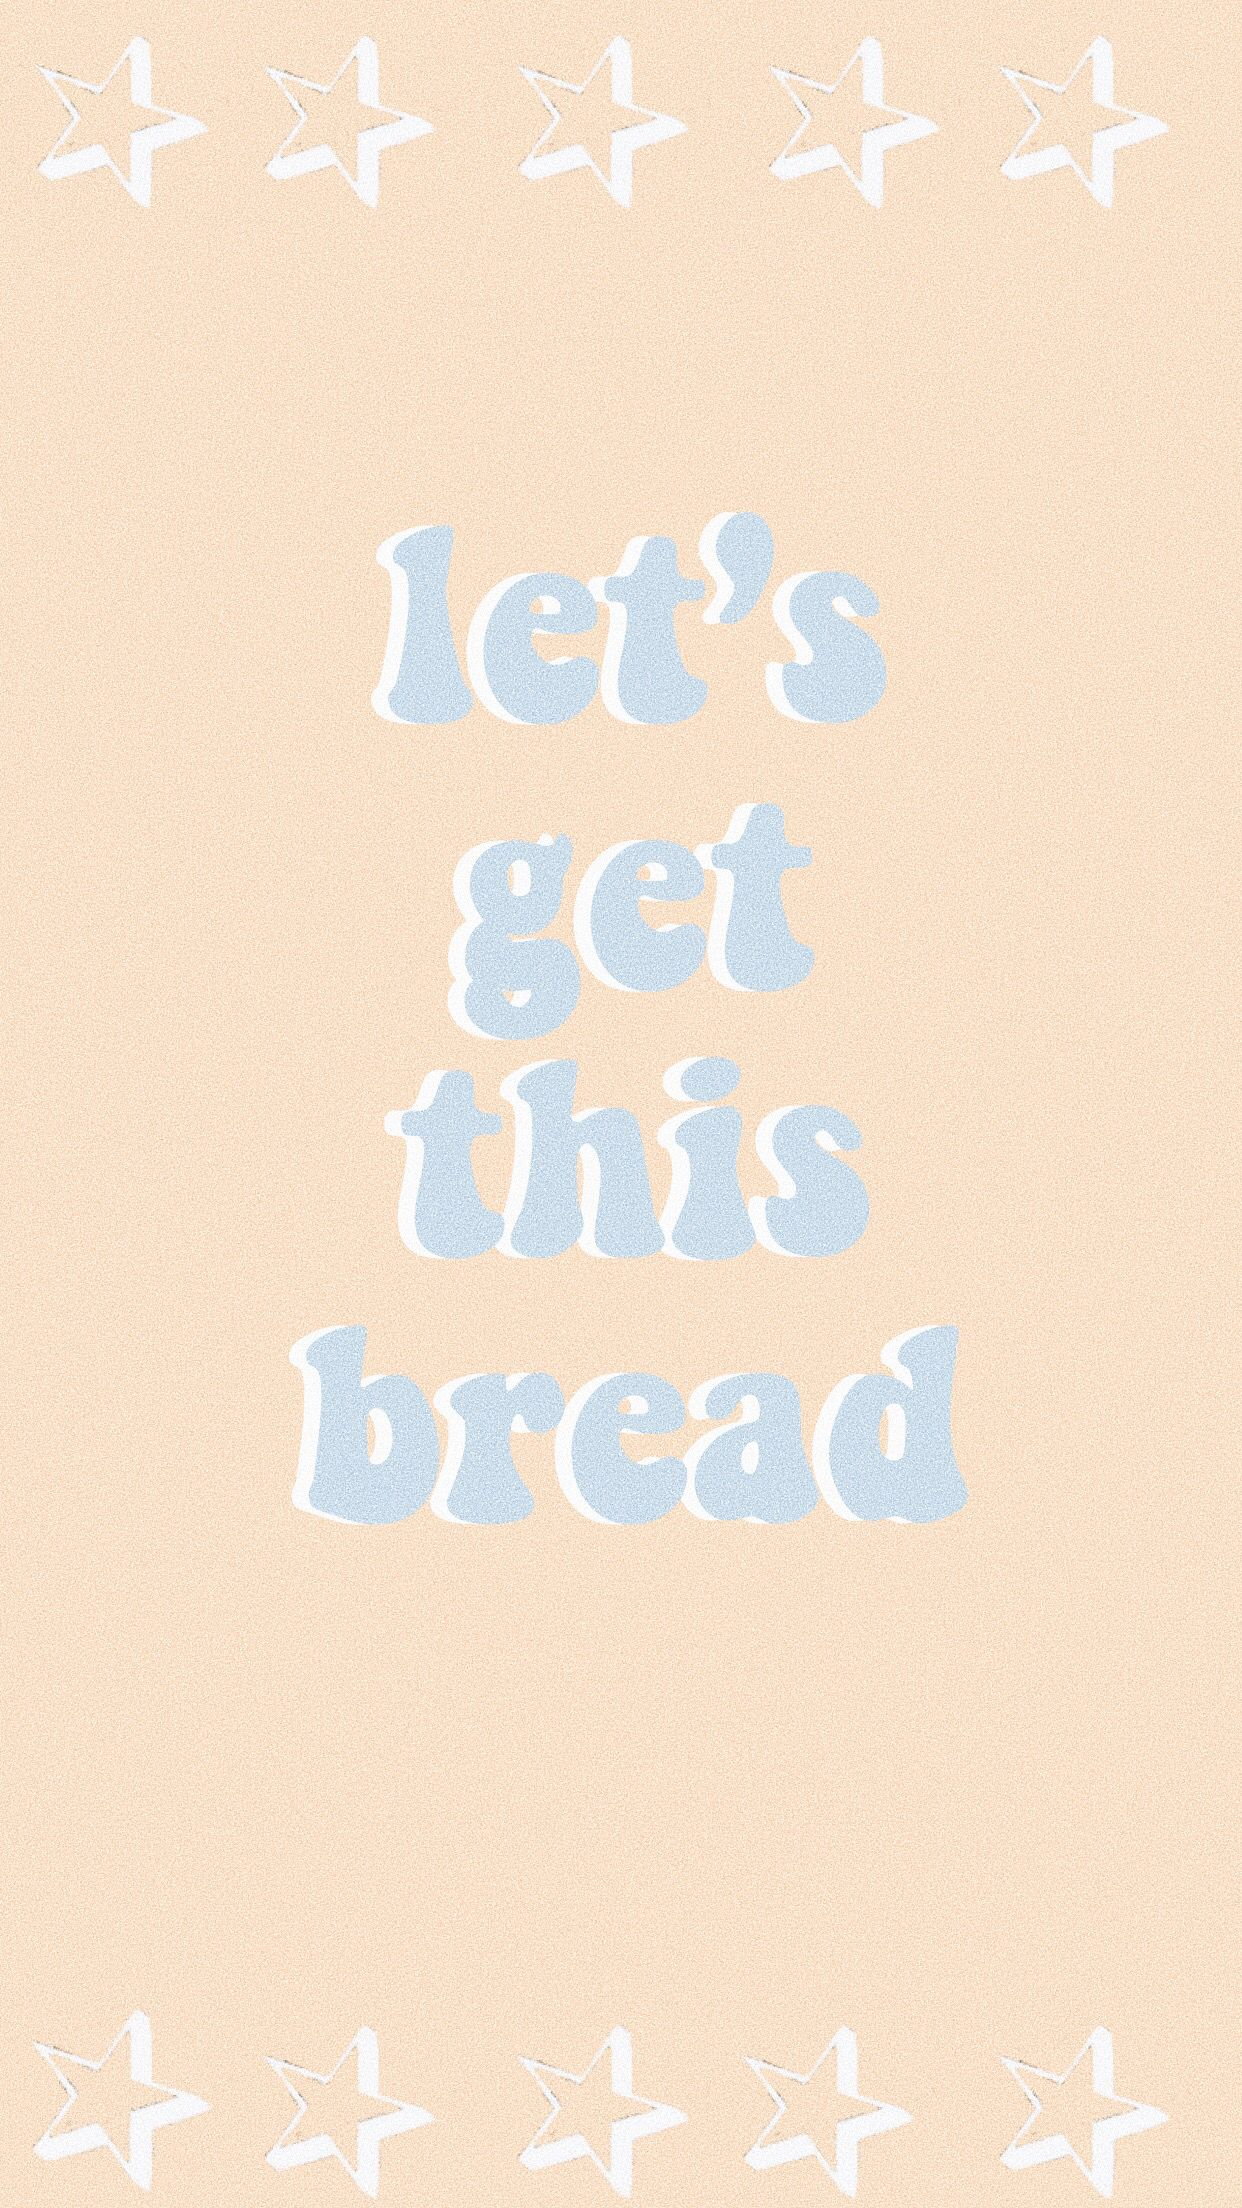 Pinterest Emma Wirt Words Wallpaper Aesthetic Iphone Wallpaper Cute Wallpapers